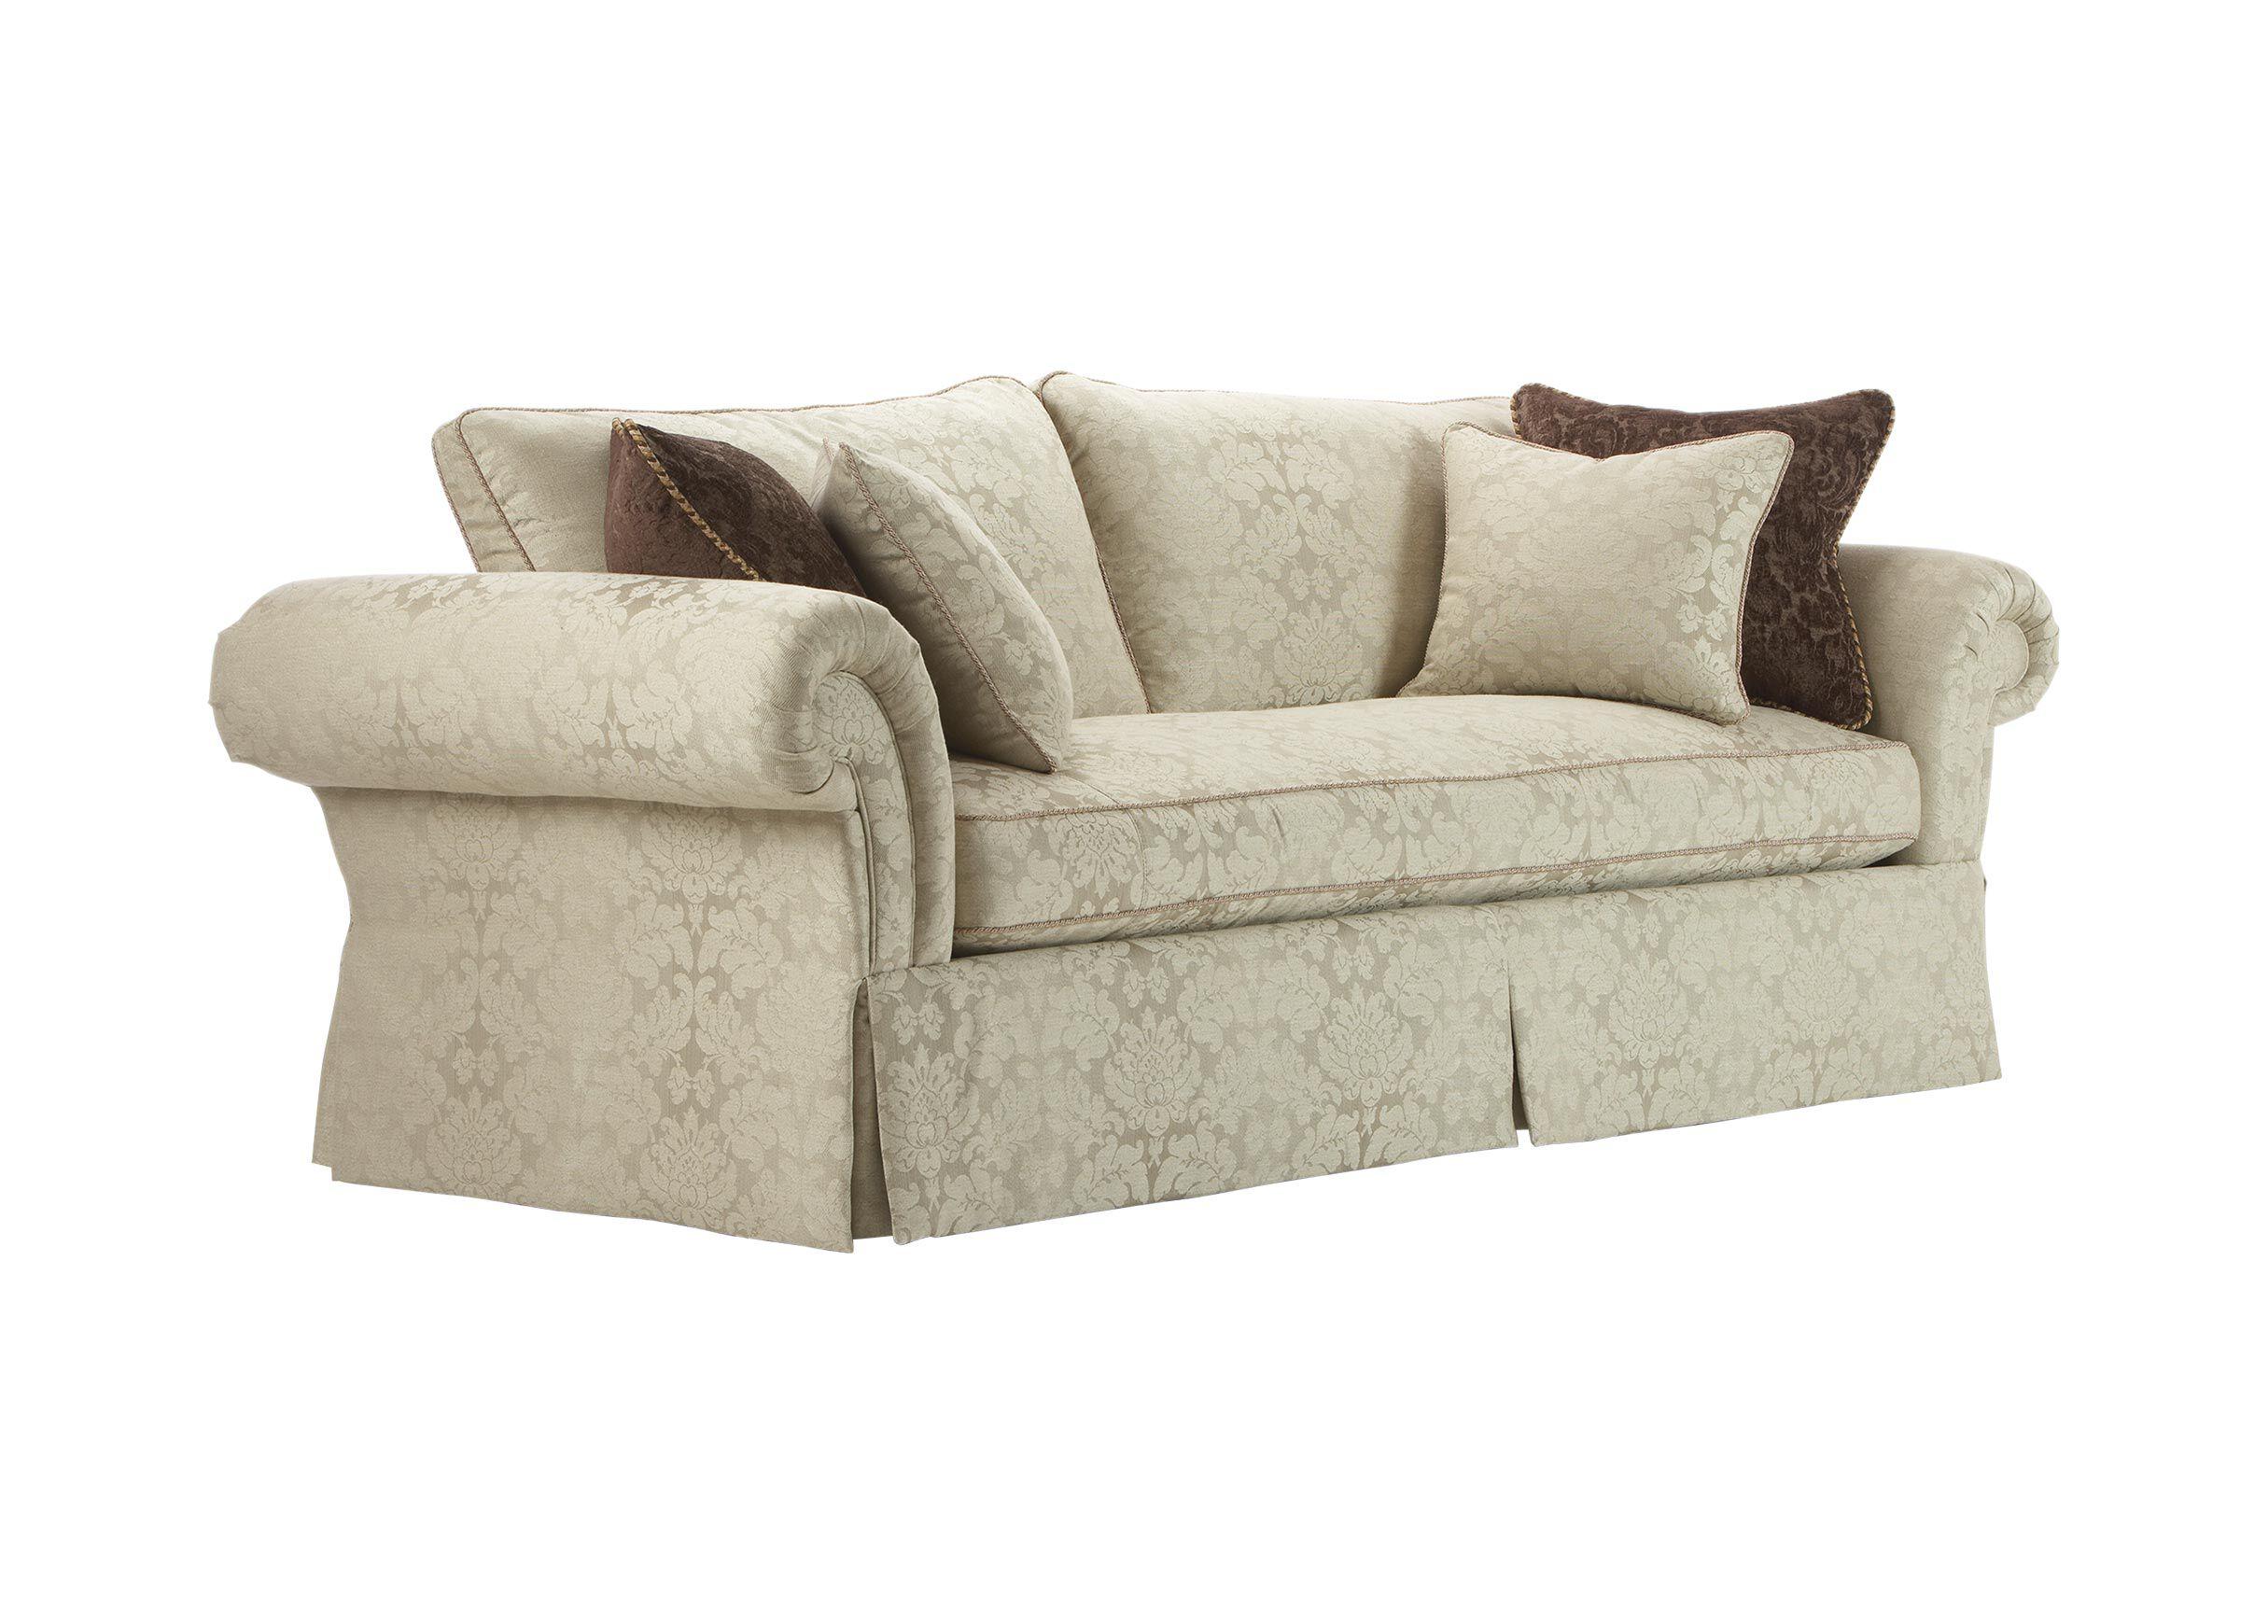 savoy leather sofa restoration hardware how to clean furniture sofas loveseats ethan allen thesofa